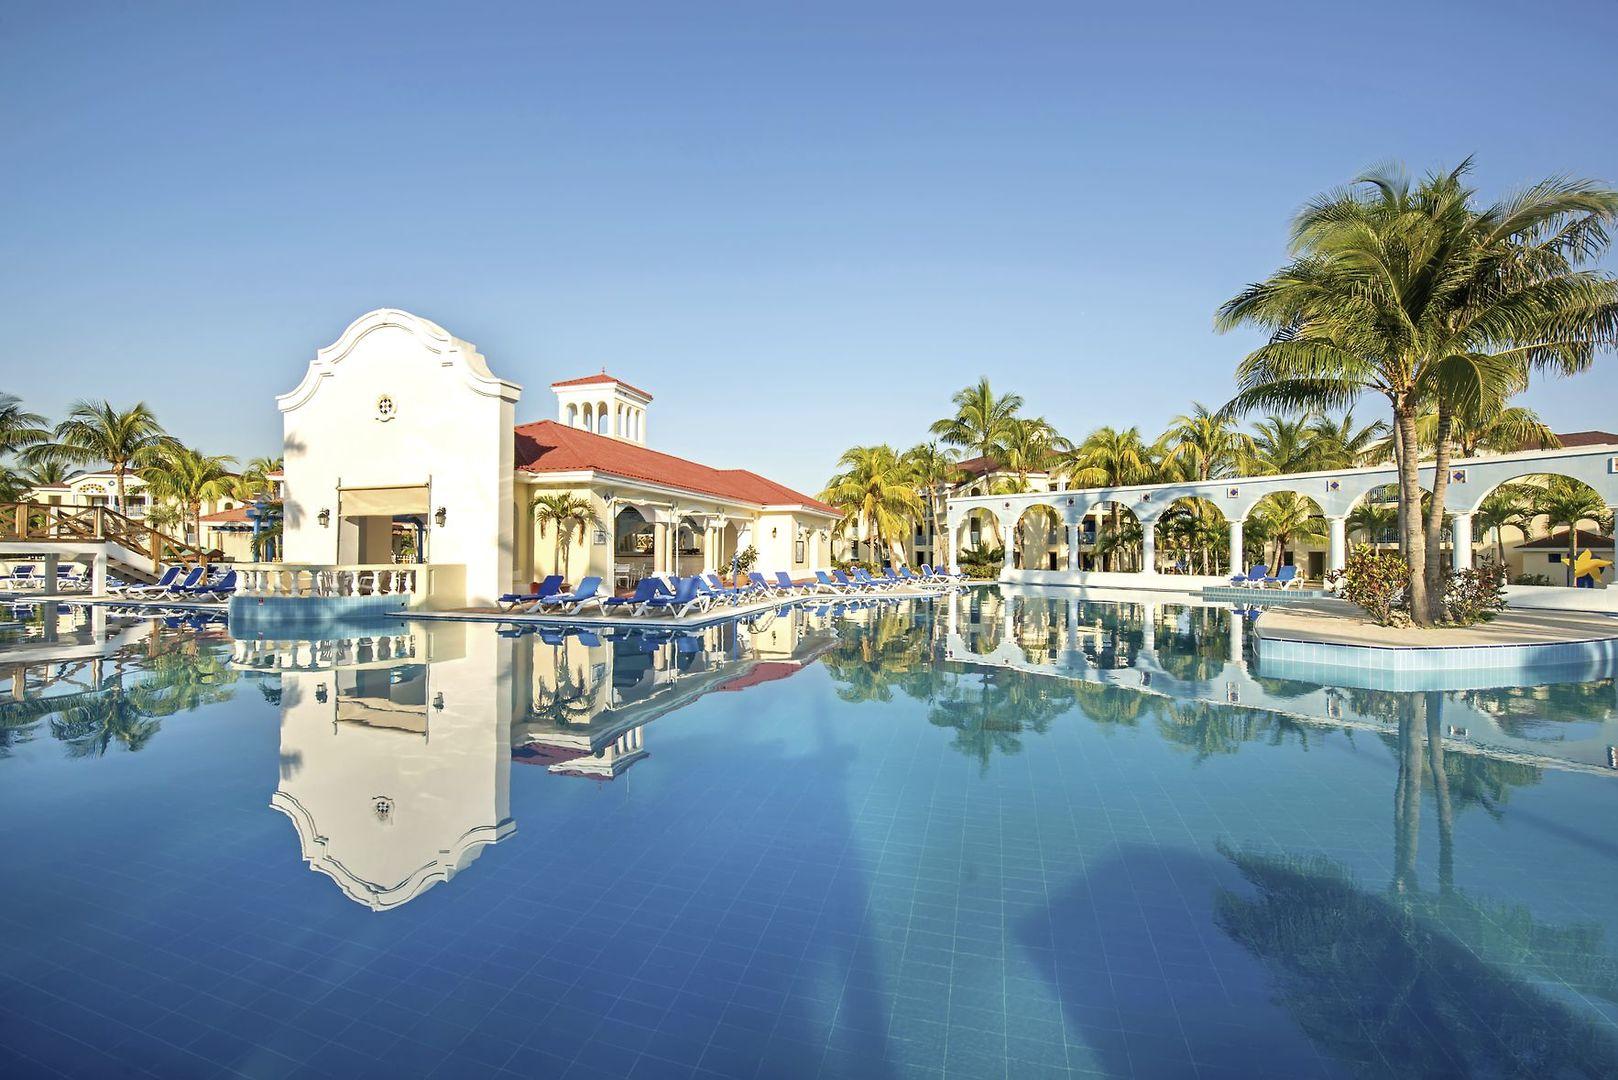 Hotel IBEROSTAR Playa Alam.